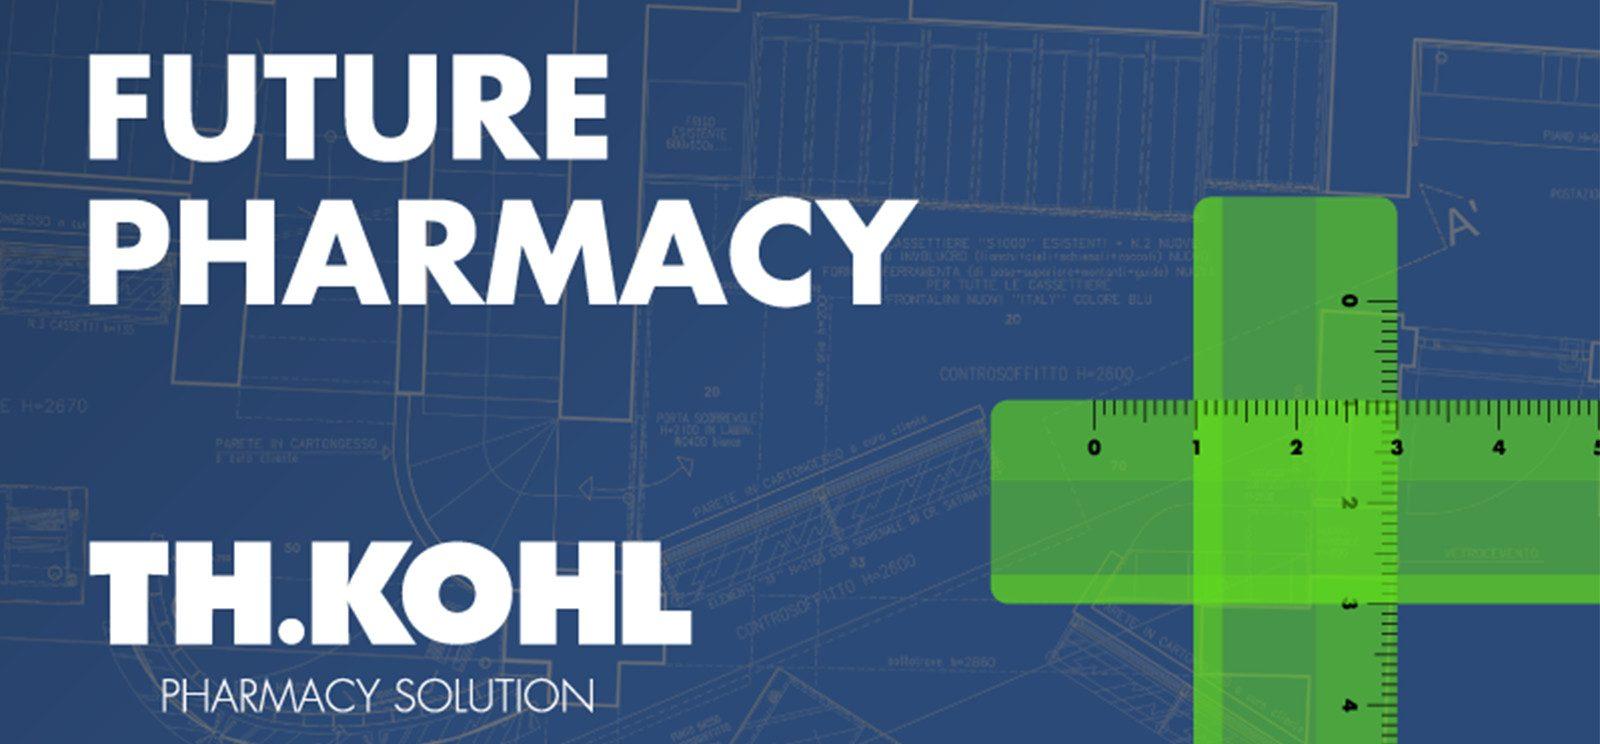 news - contest future pharmacy